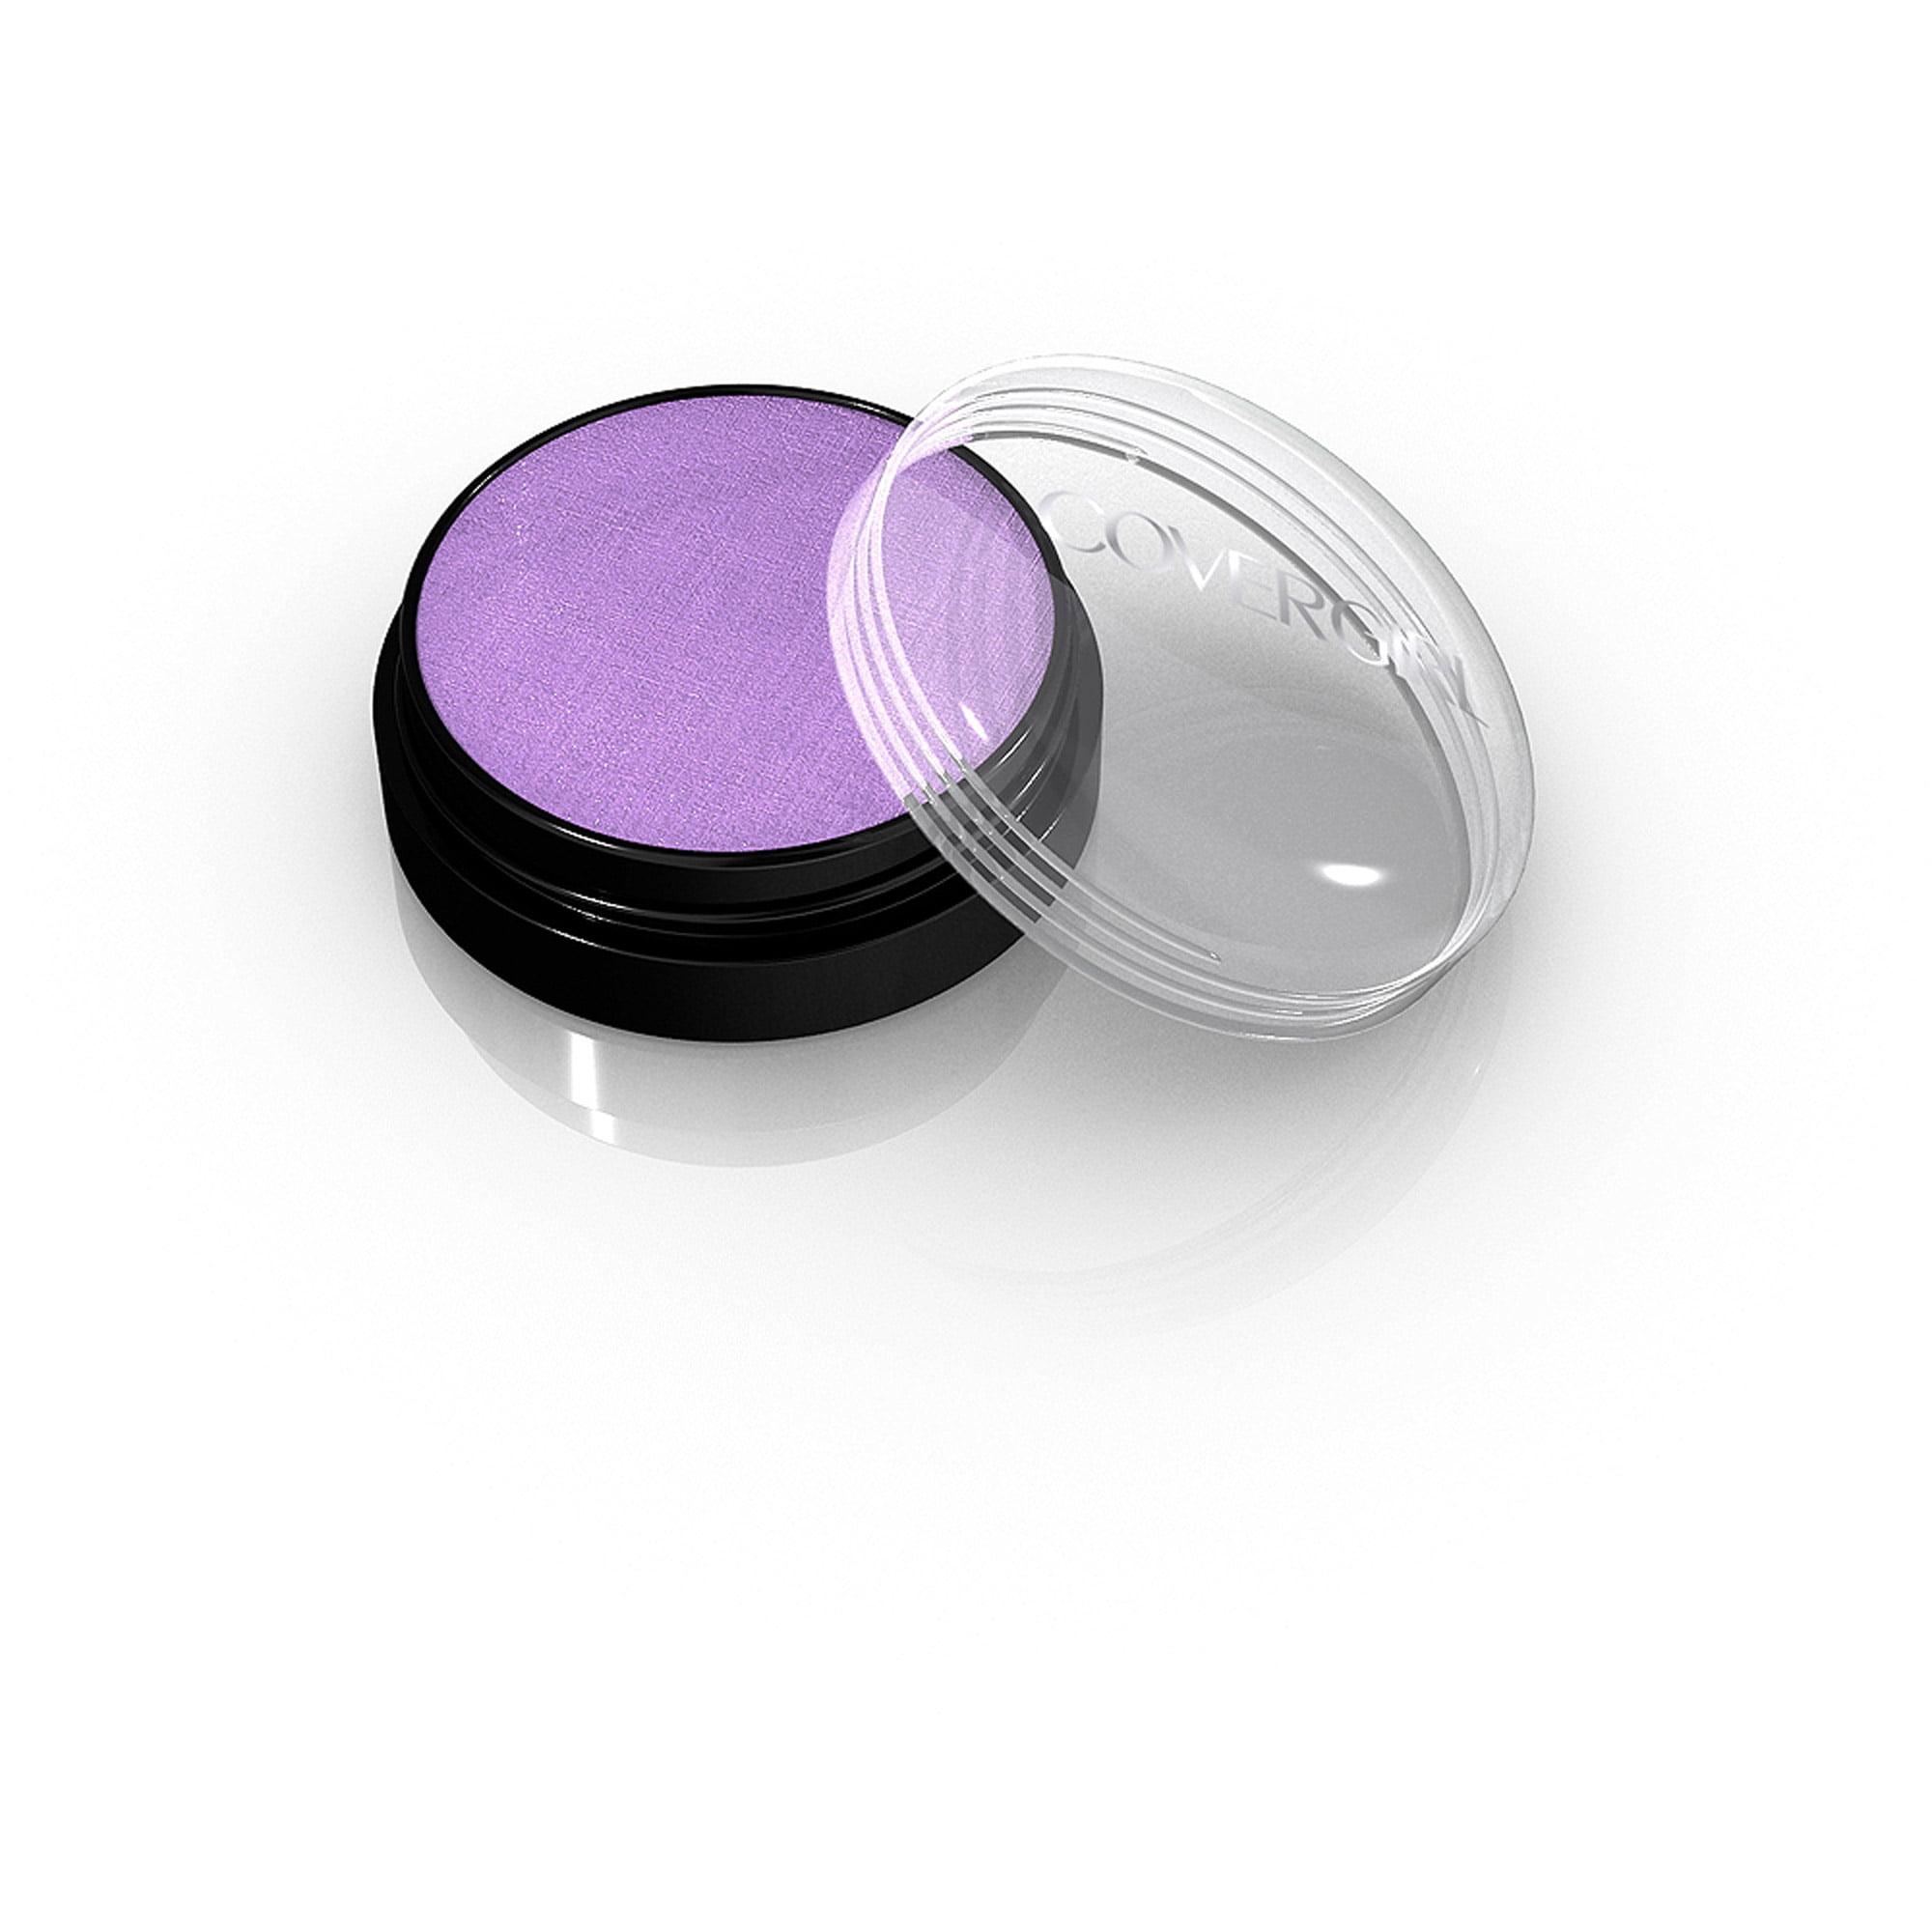 CoverGirl Flamed Out Eye Shadow, 340 Blazing Purple, 0.07 oz